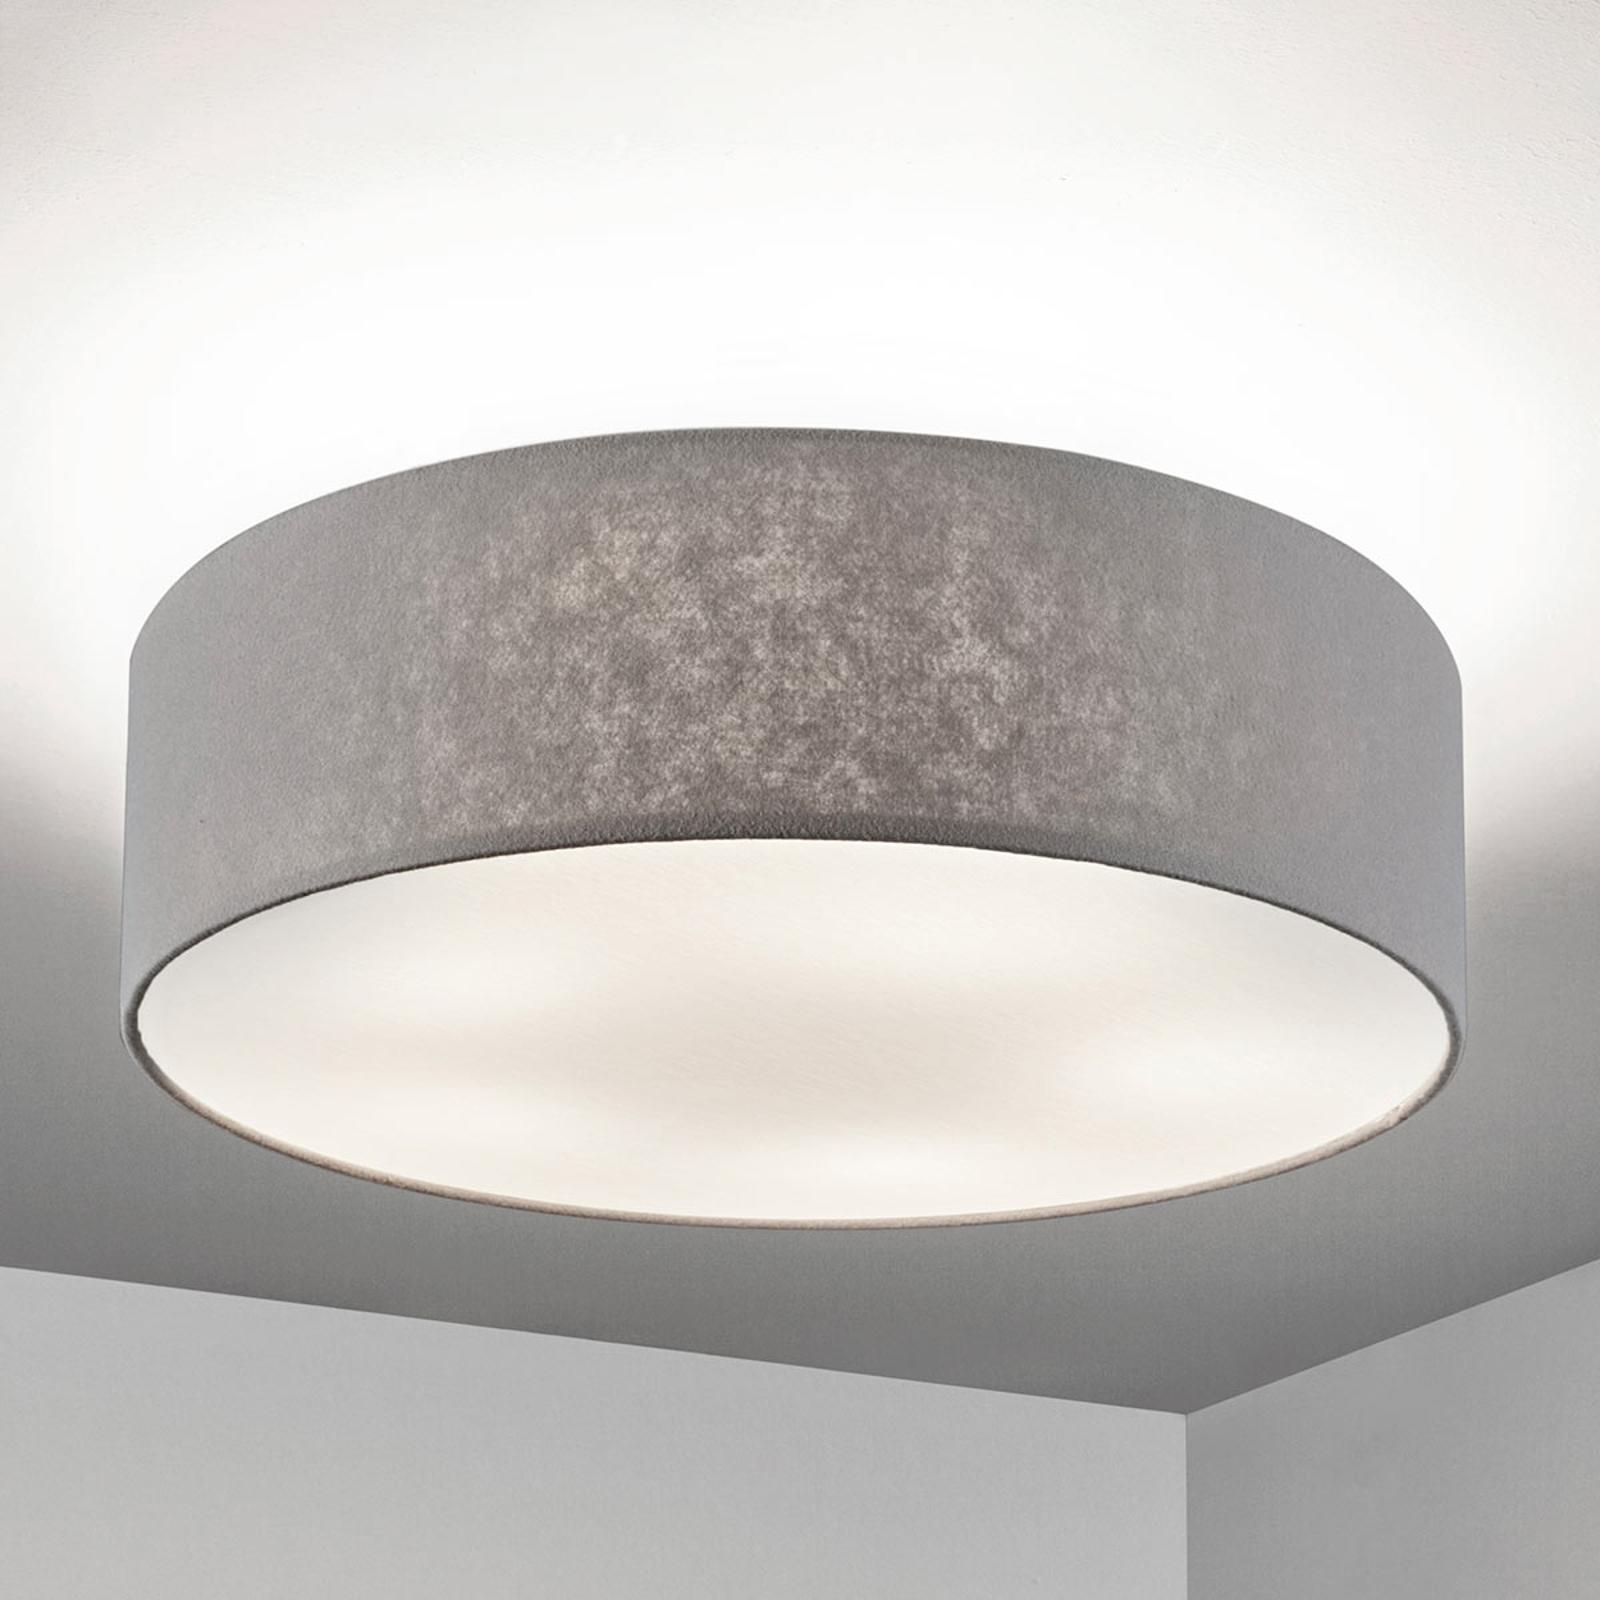 Plafondlamp Gala, 60cm, vilten kap grijs